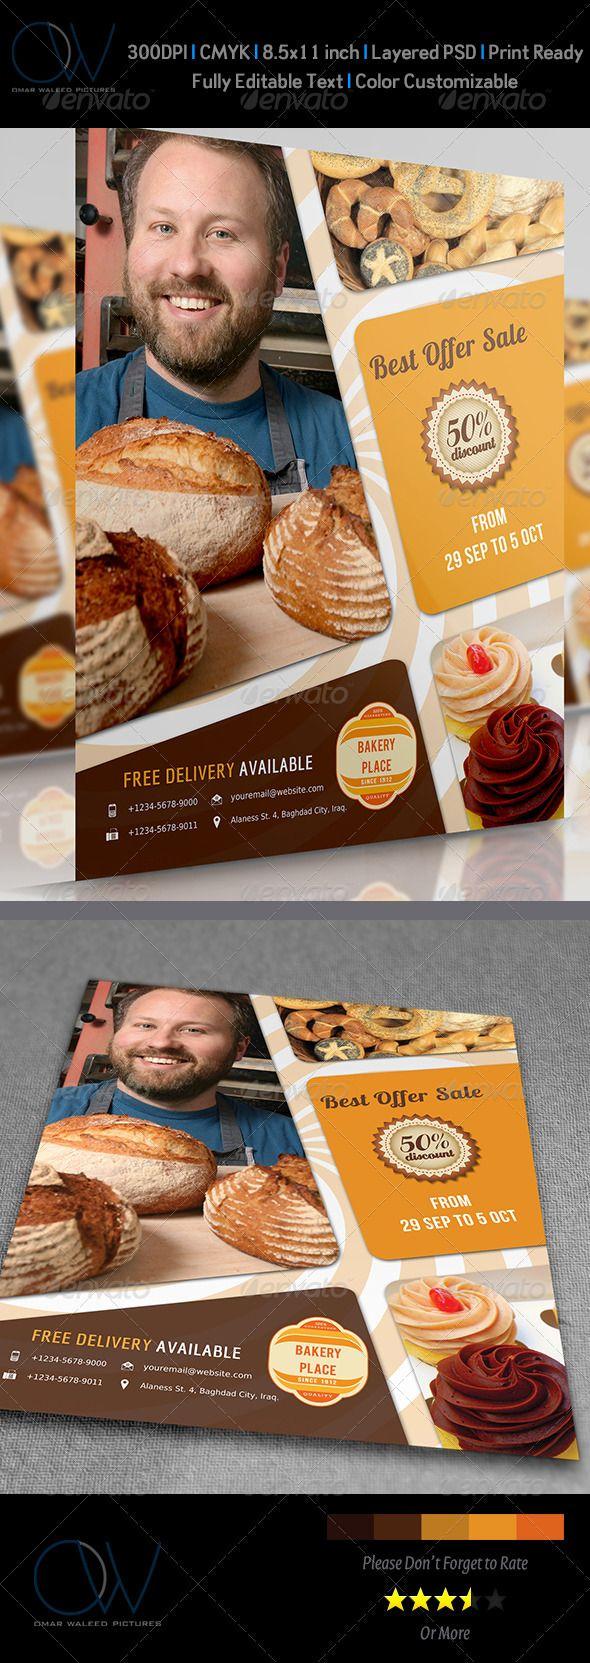 Bakery Flyer   Restaurant, Texts and Bakeries